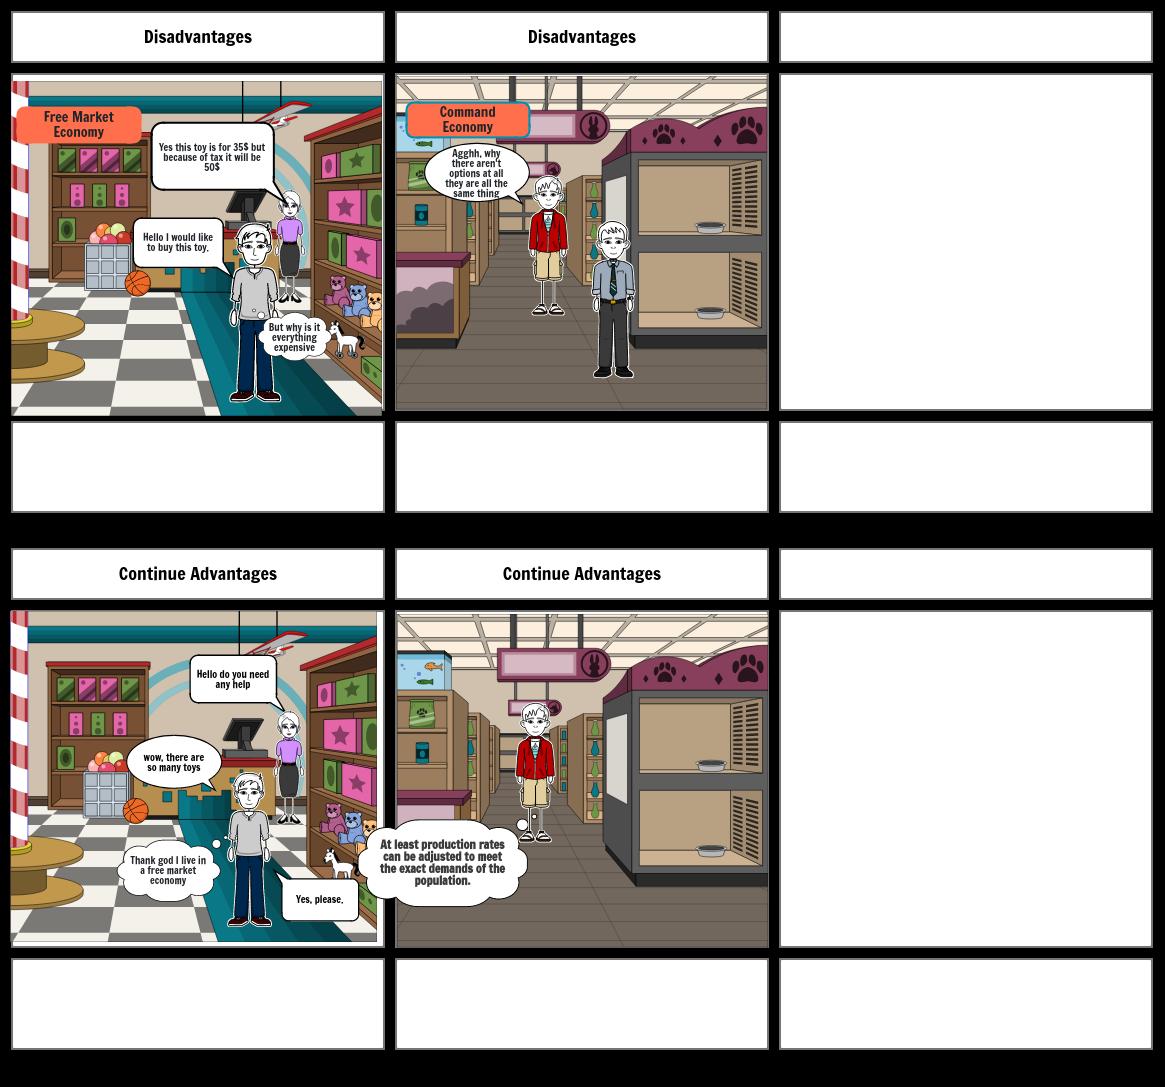 Geography comic book economy's